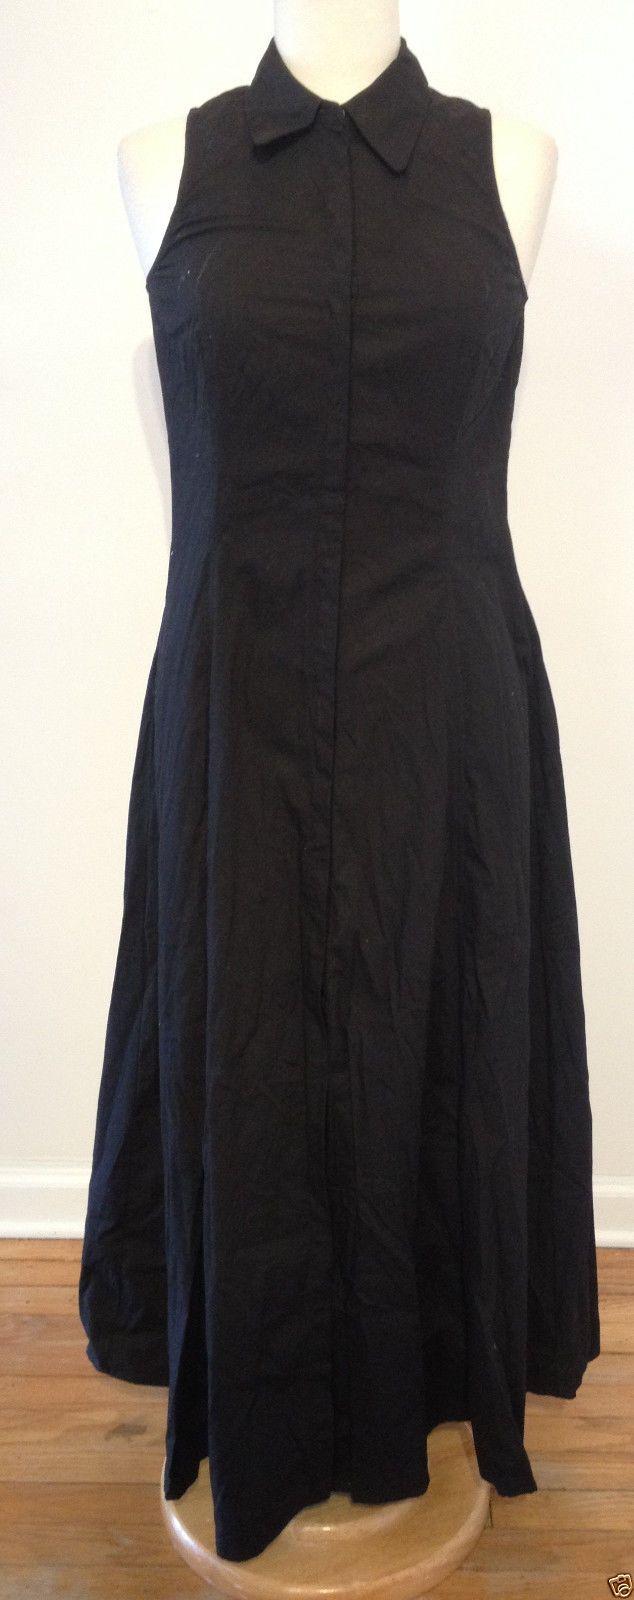 Newport news black cotton sleeveless snap front maxi shirt long